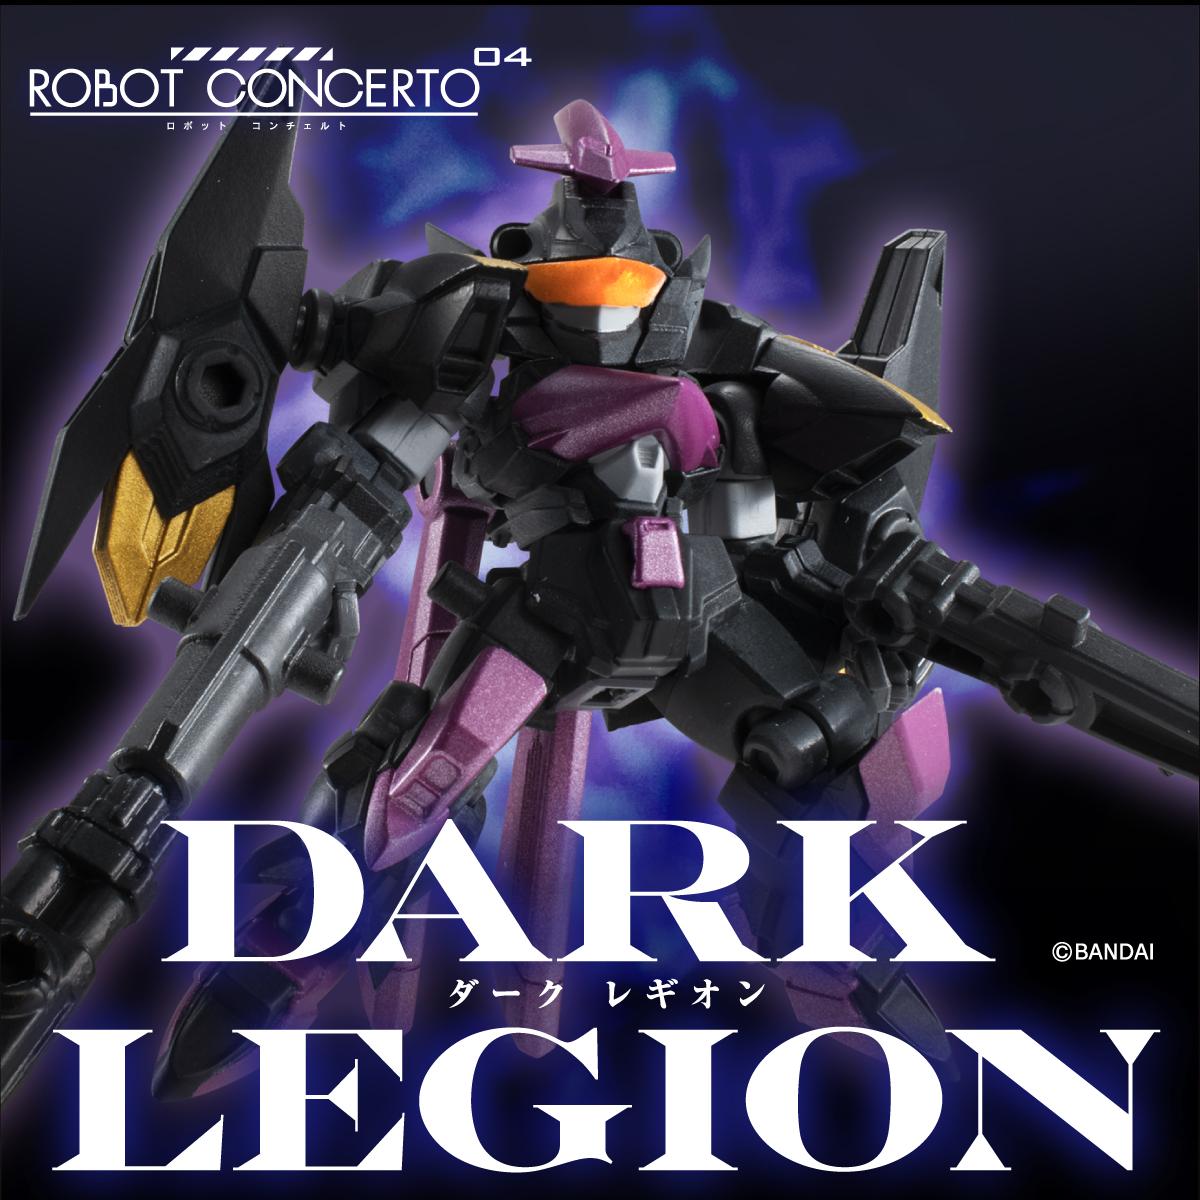 ROBOT CONCERTO 04 DARK LEGION (PB SET)